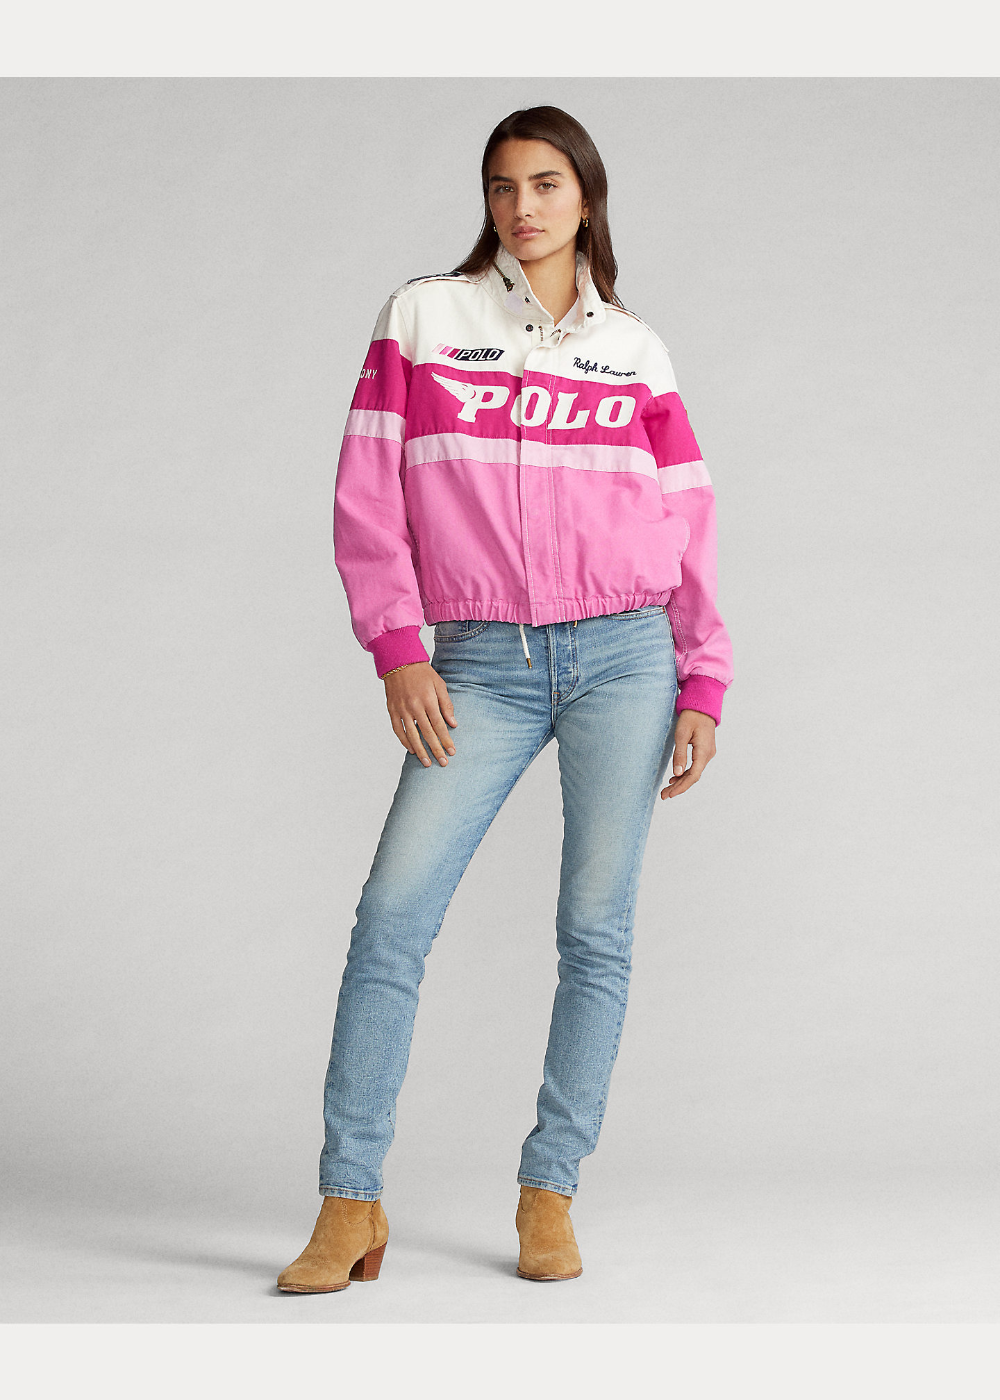 Pink Pony Cotton Canvas Bomber Jacket Pink Bomber Jacket Bomber Jacket Jackets [ 1400 x 1000 Pixel ]